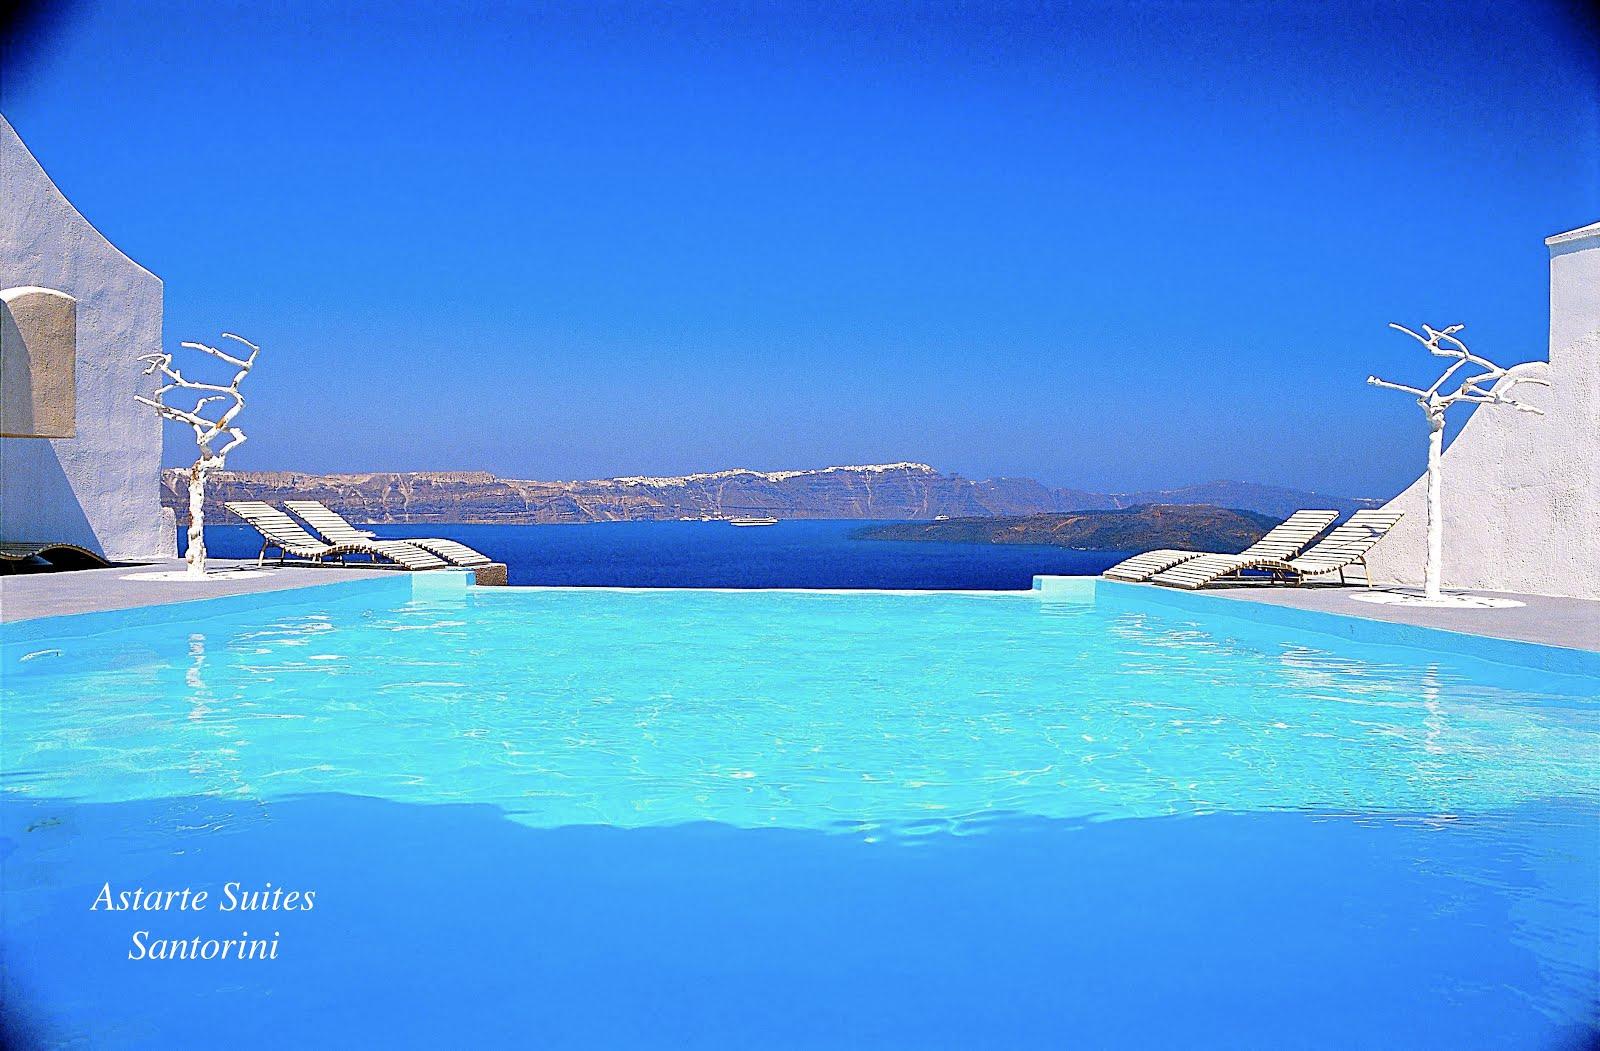 Astarte suites santorini greece honeymoon getaway for Santorini astarte suites